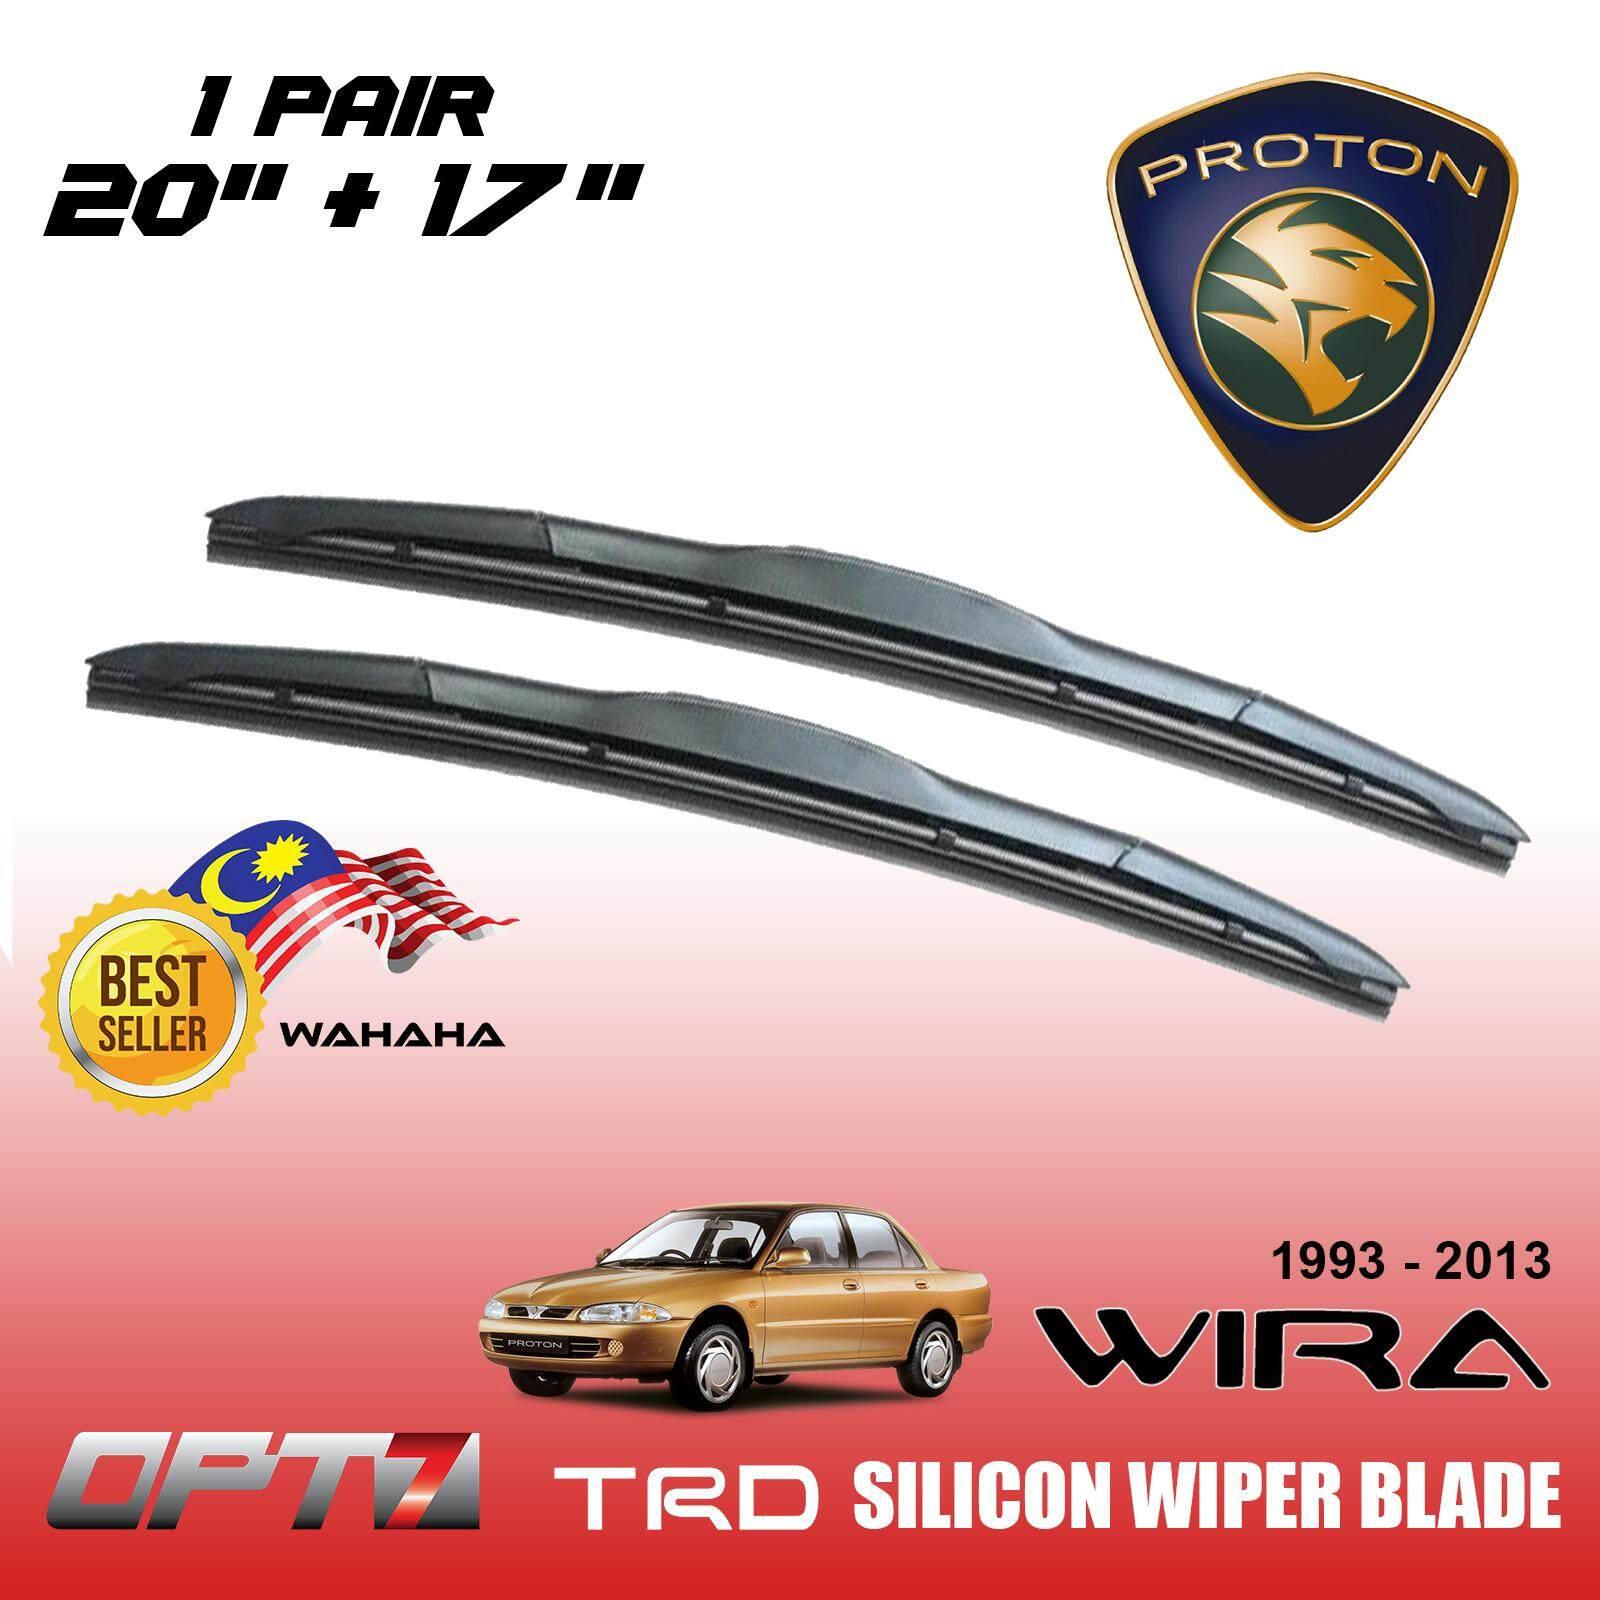 Proton Wira 1993-2013 U Shape OPT7 Window Windshield TRD Silicon Wiper Blade 20  + 17